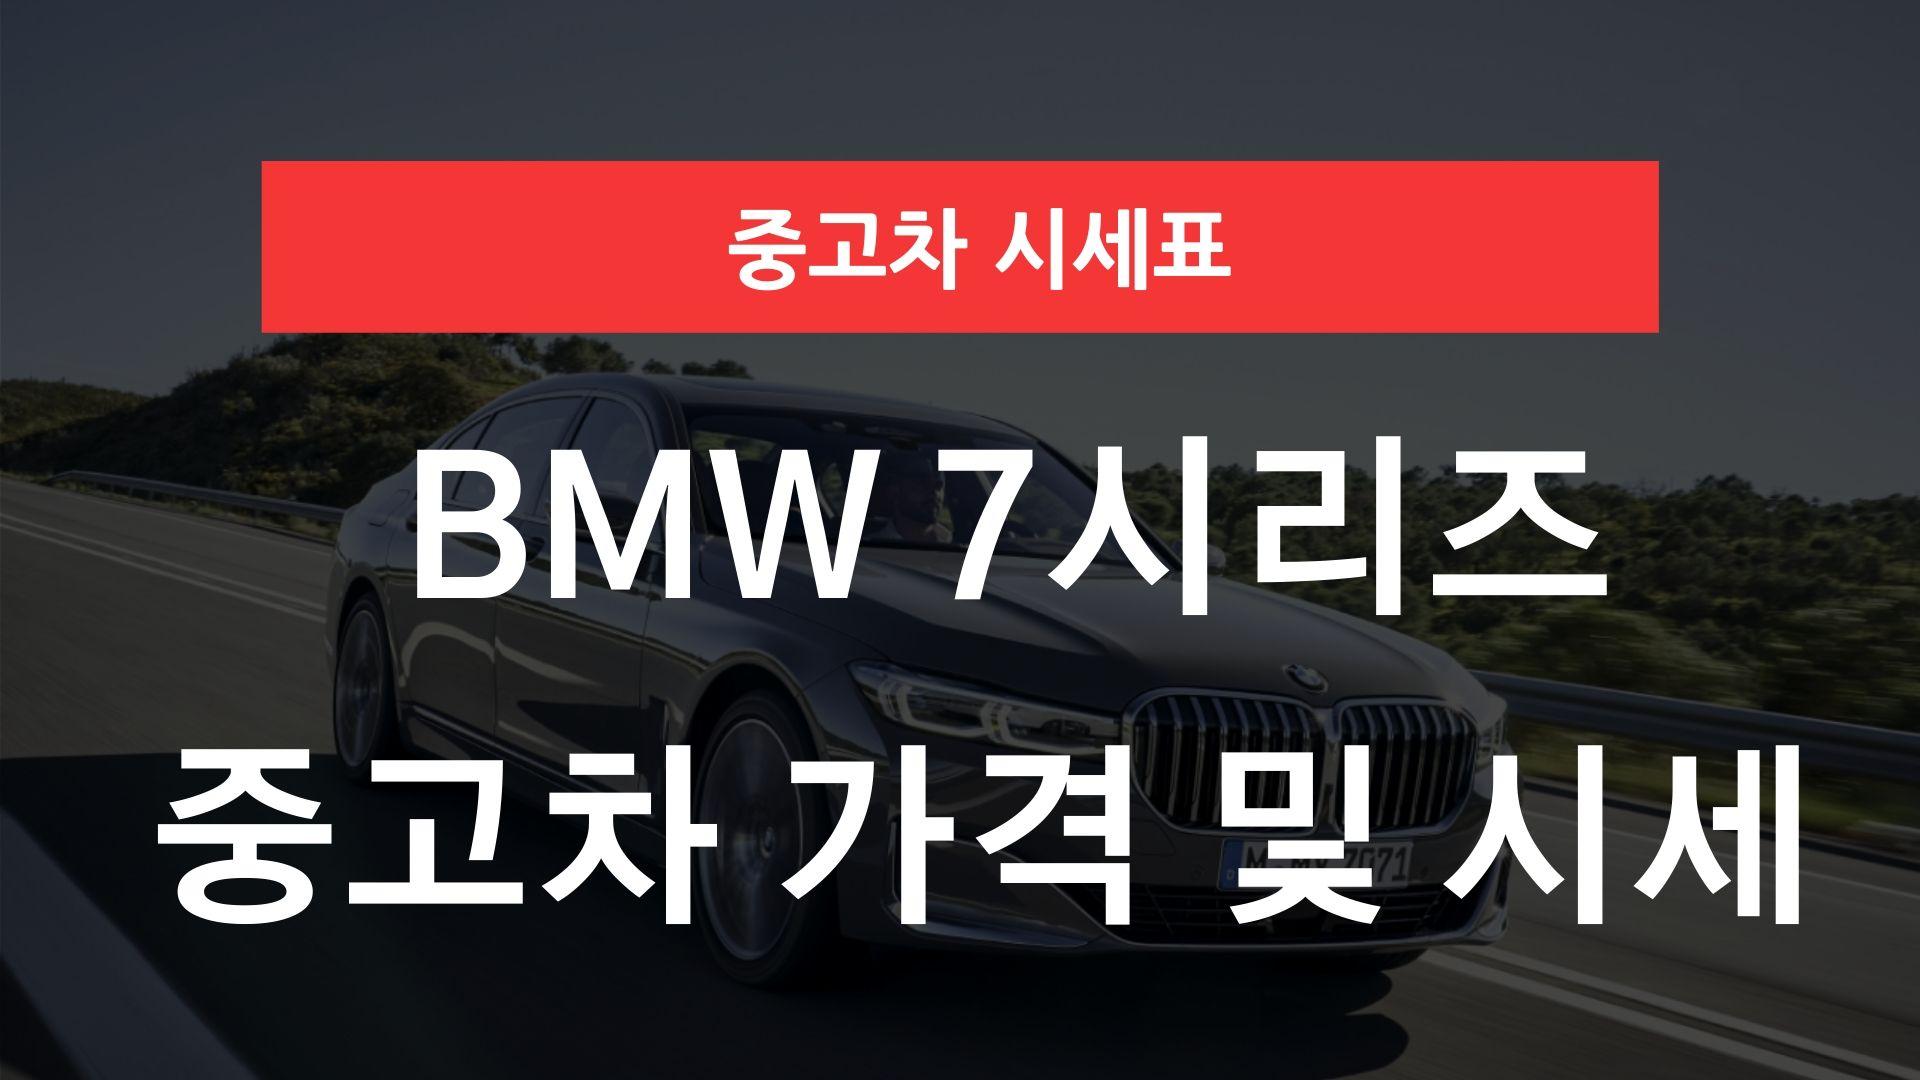 BMW 7시리즈 중고차 가격